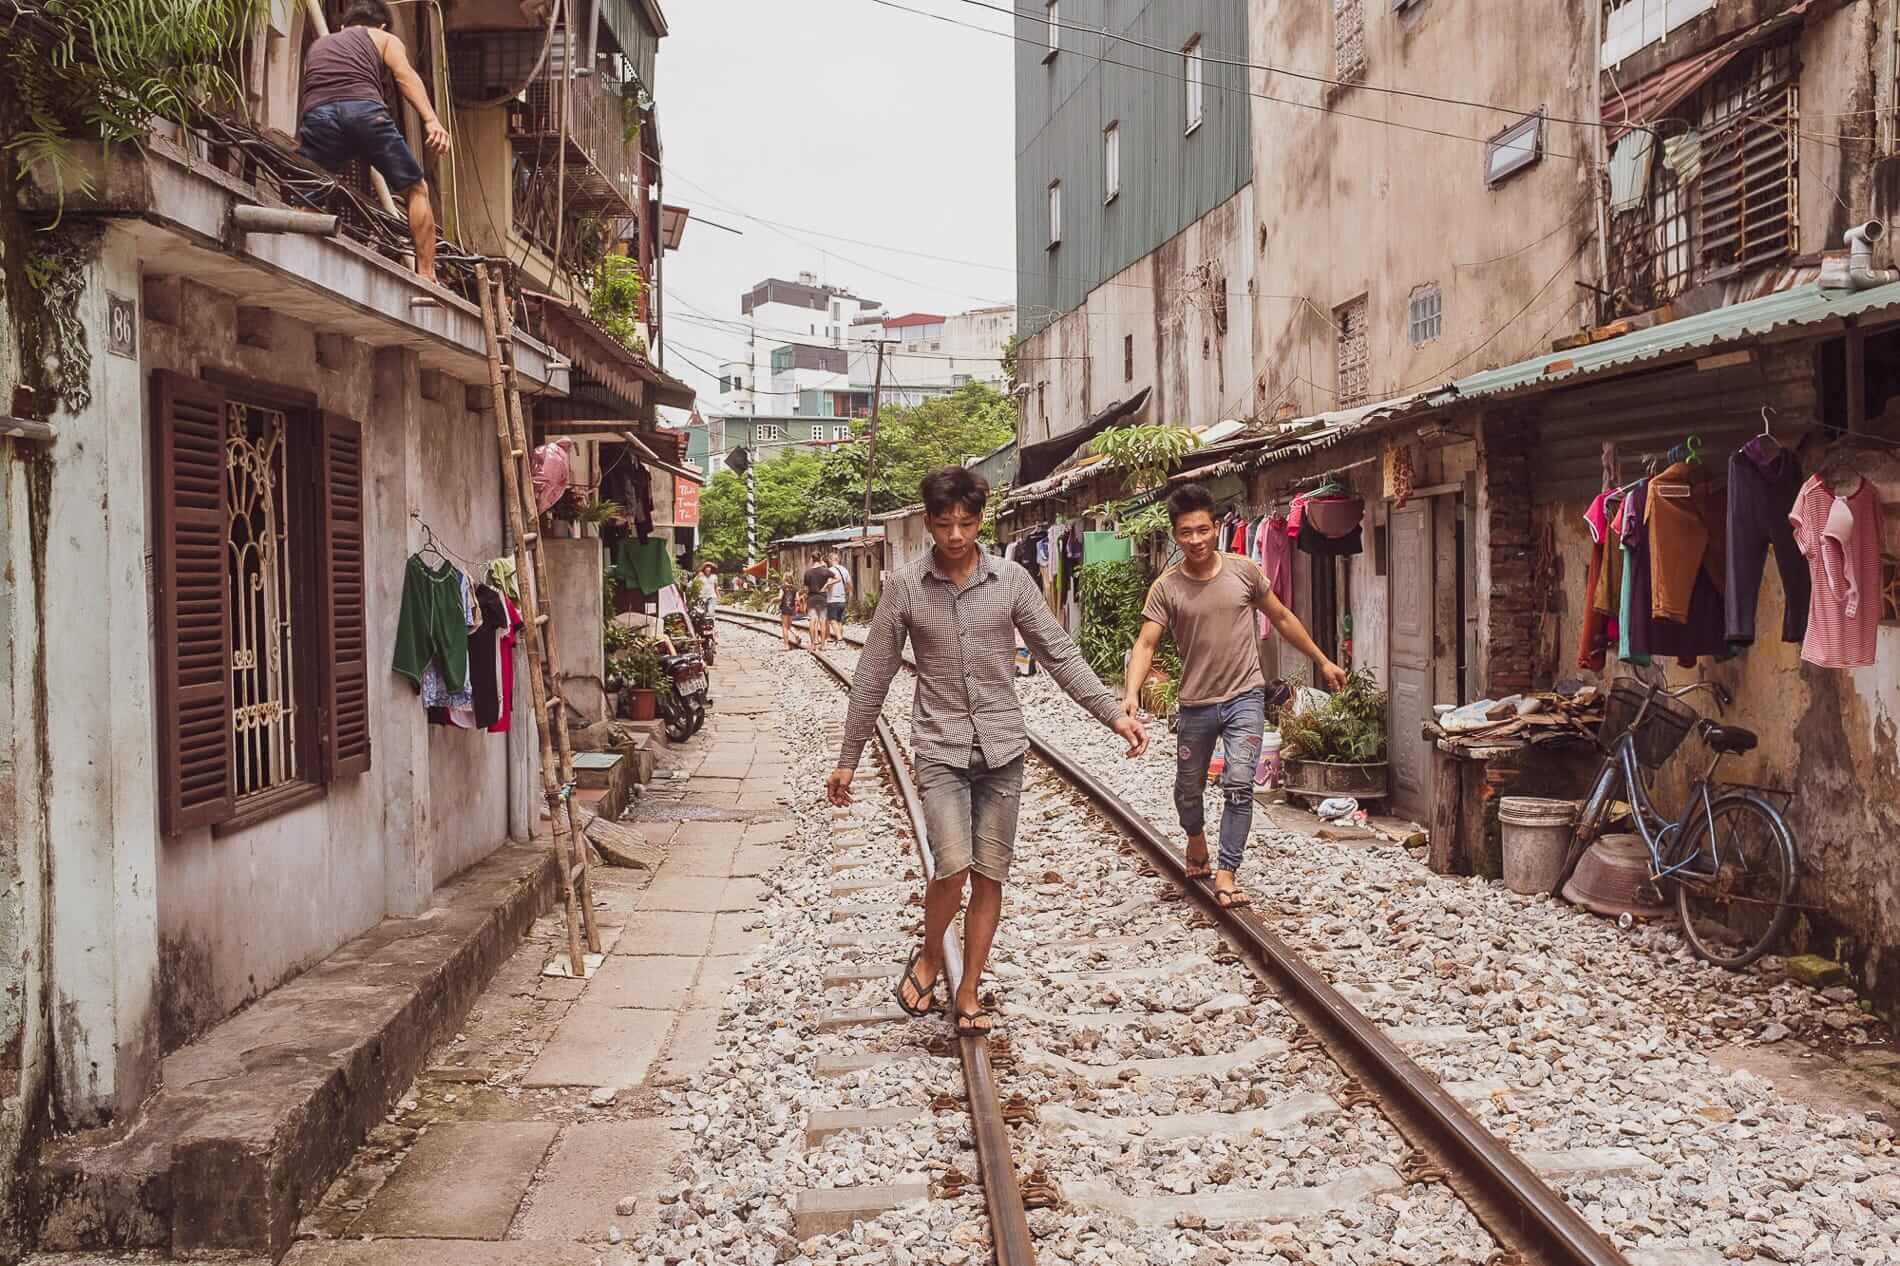 teens walking on train tracks in Hanoi